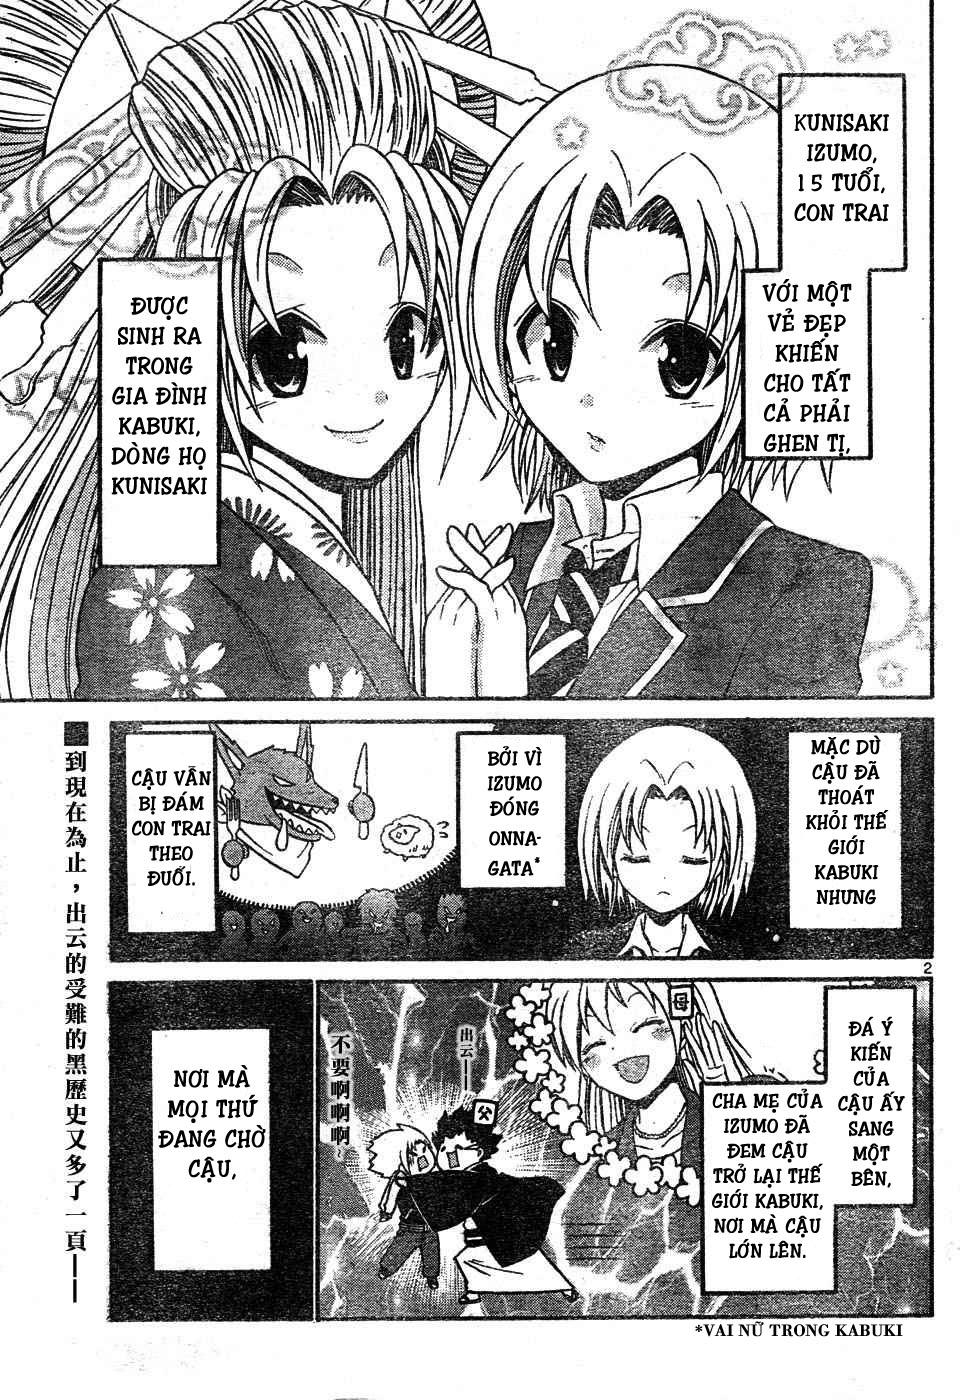 Kunisaki Izumo no Jijou Chap 4 - Trang 3